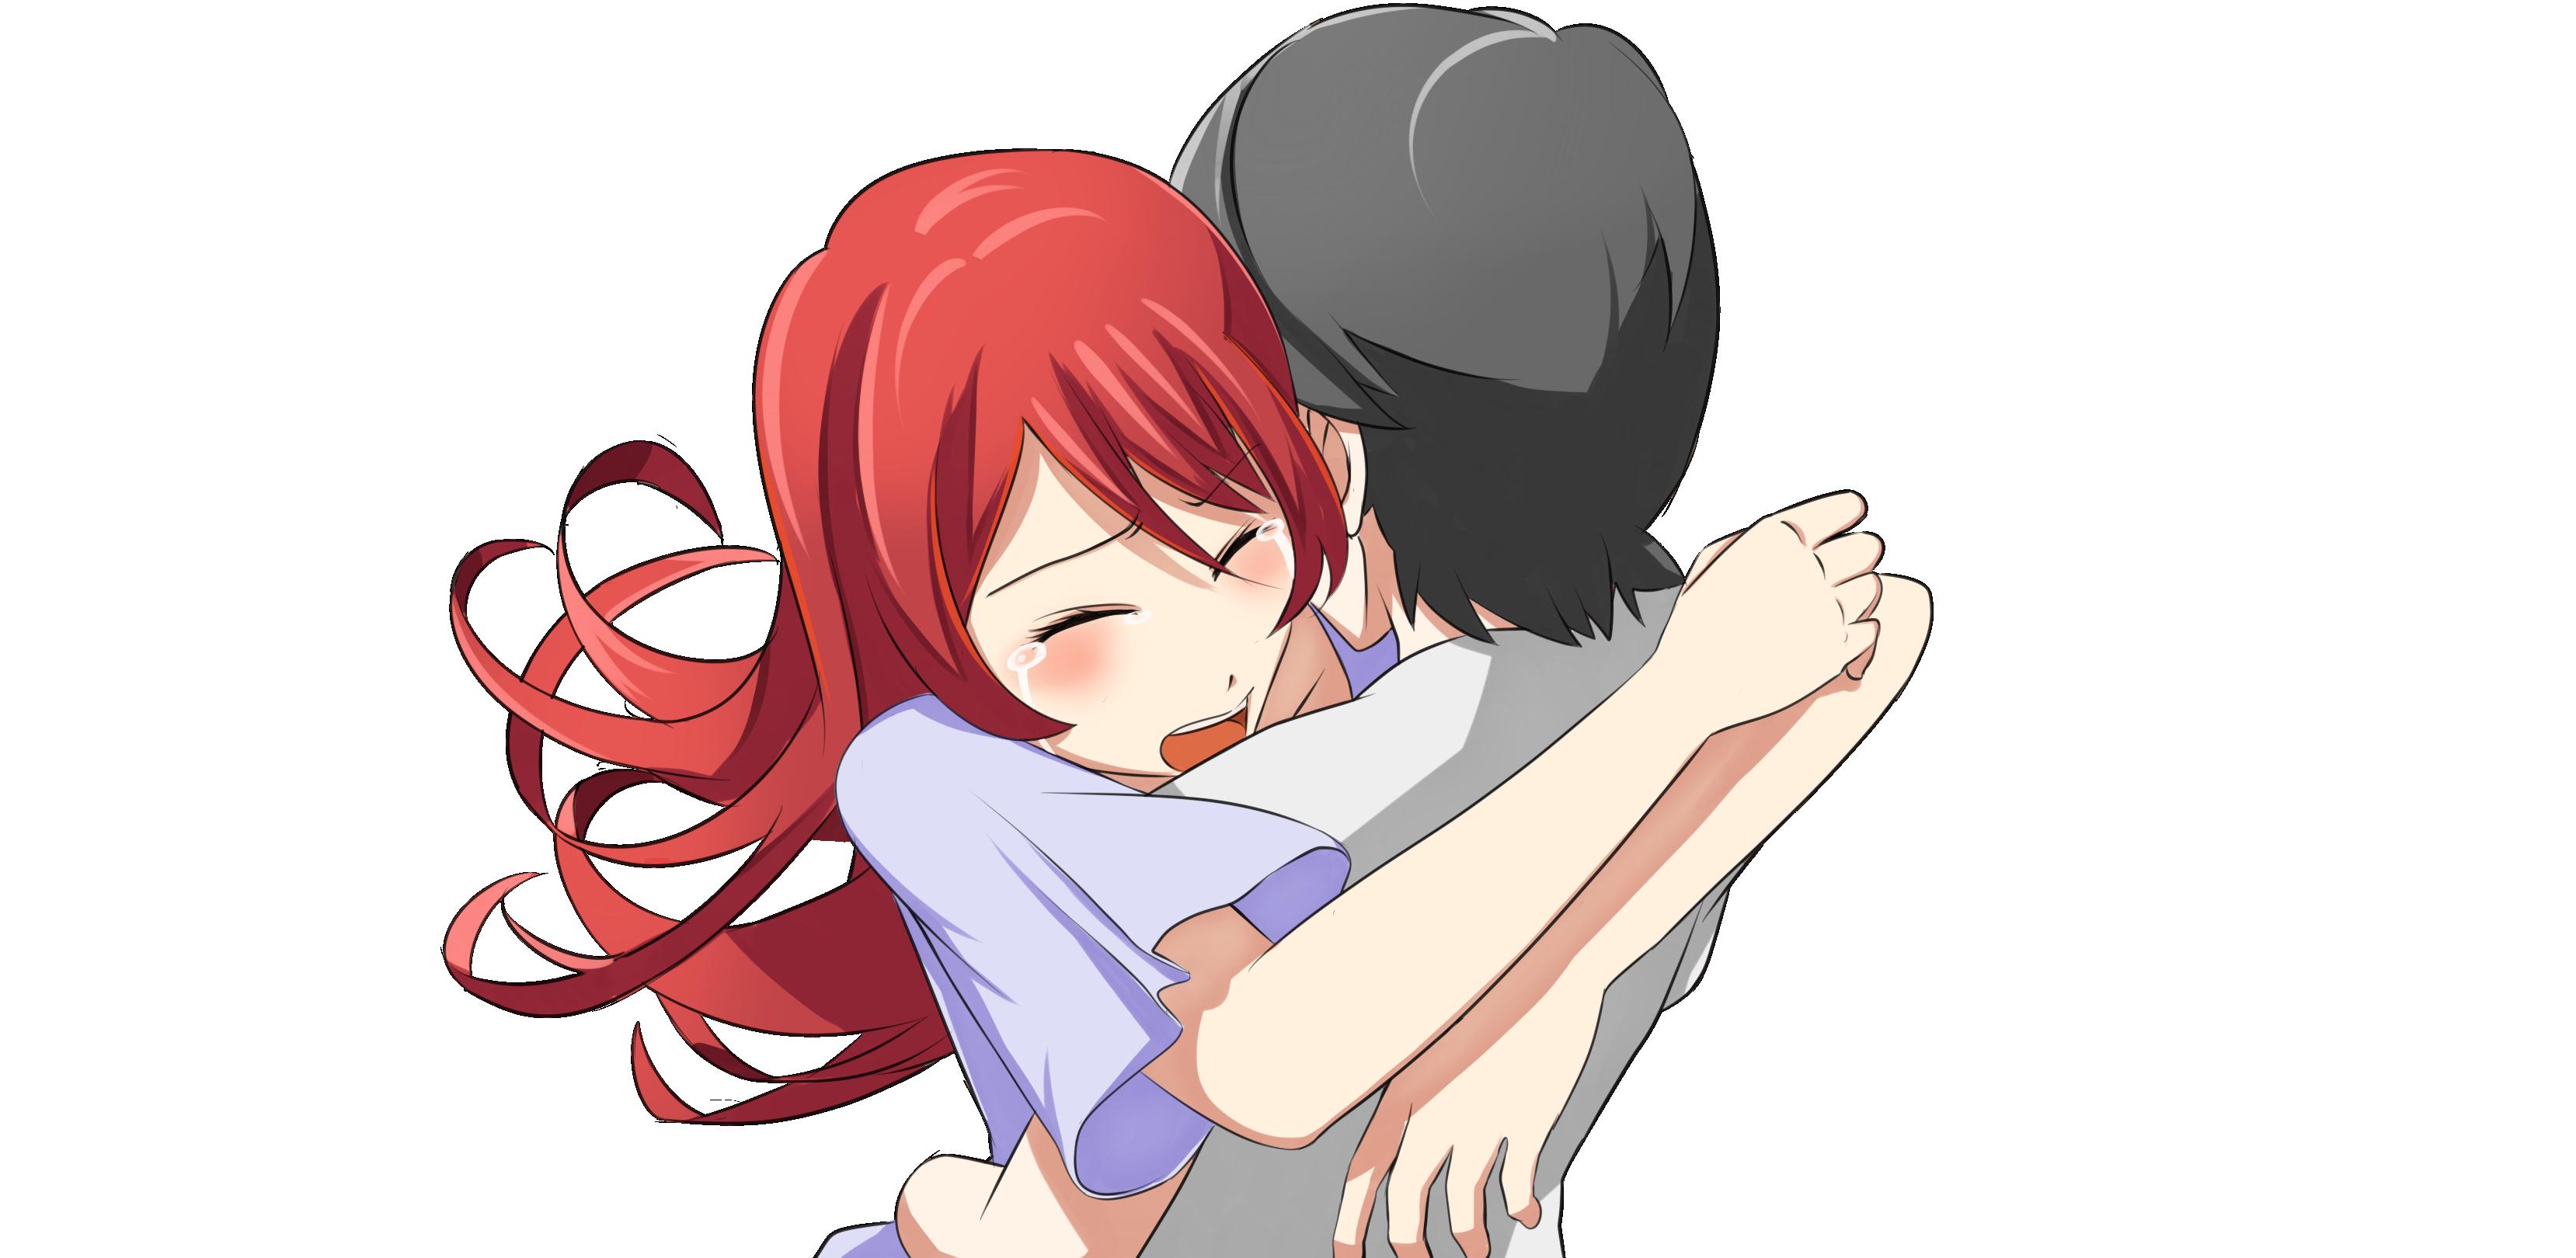 Nayuki's second CG